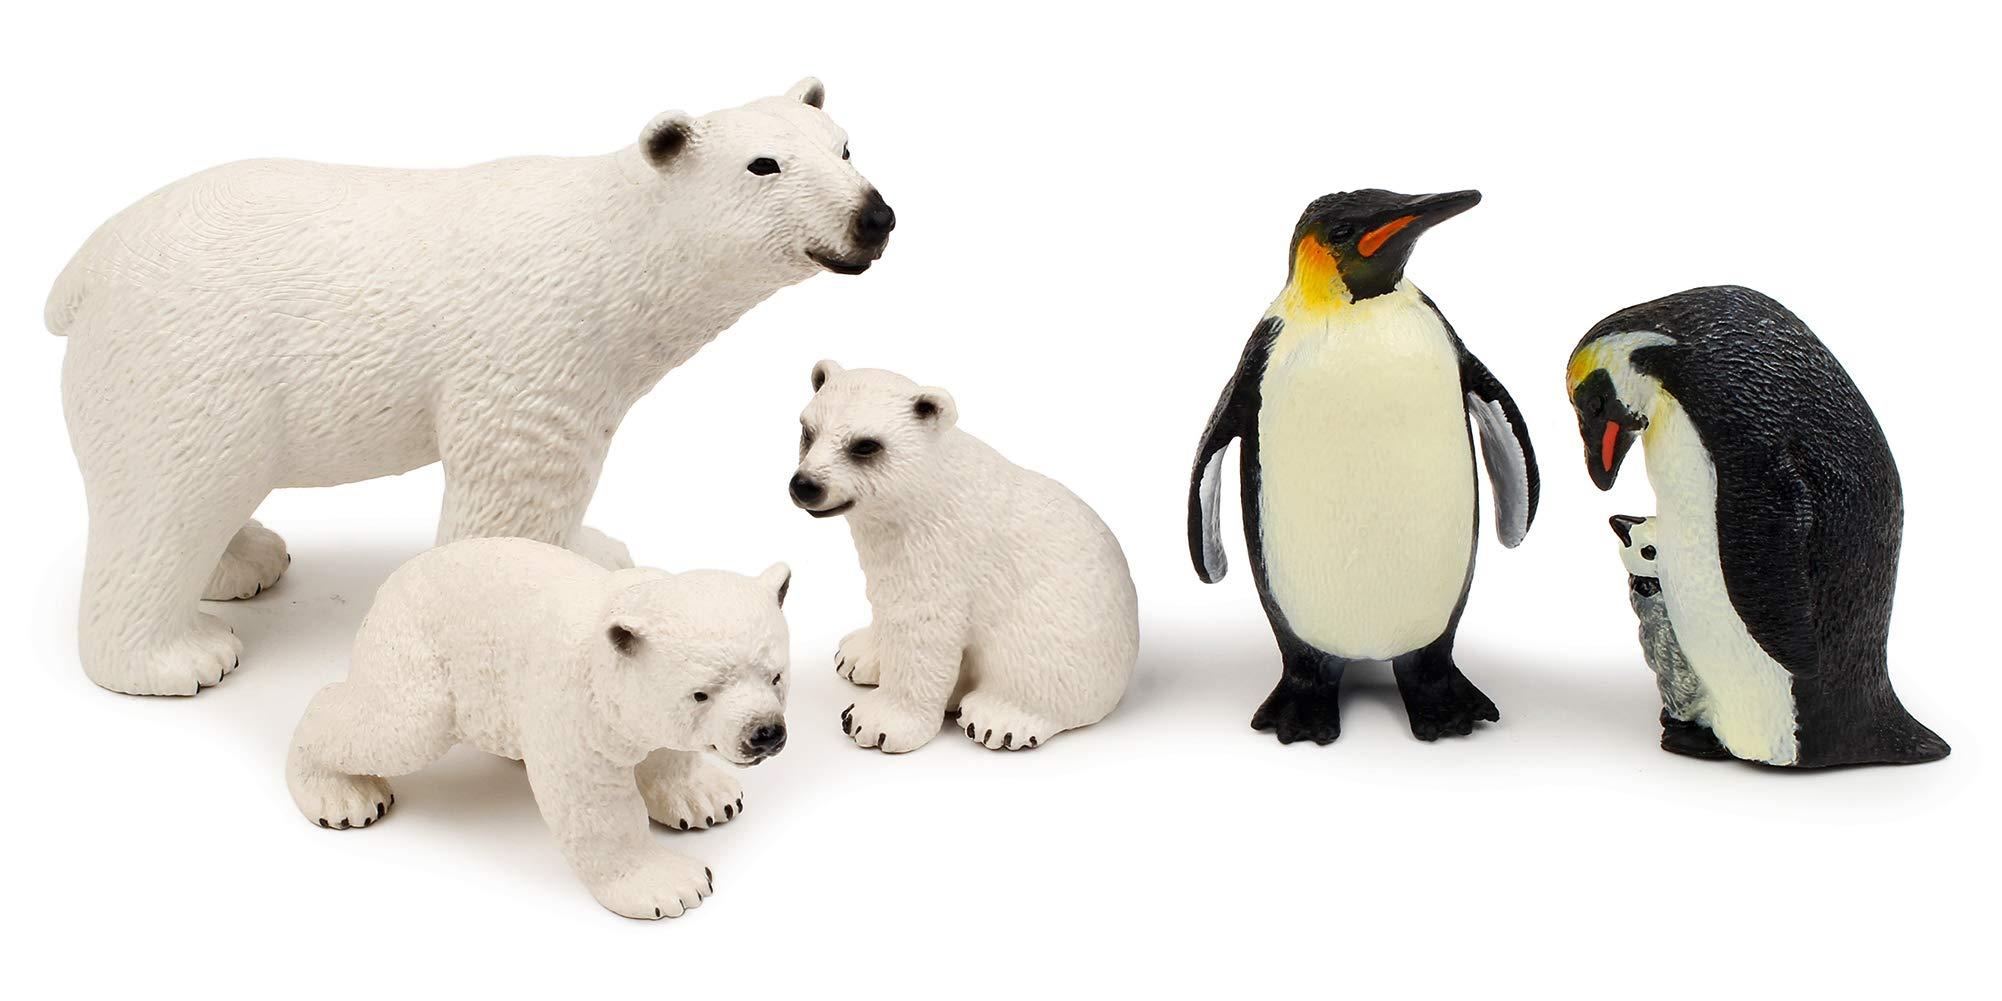 Polar Animal Toy Figurines Set, Includes Polar Bear Family & Emperor Penguin Family Figures